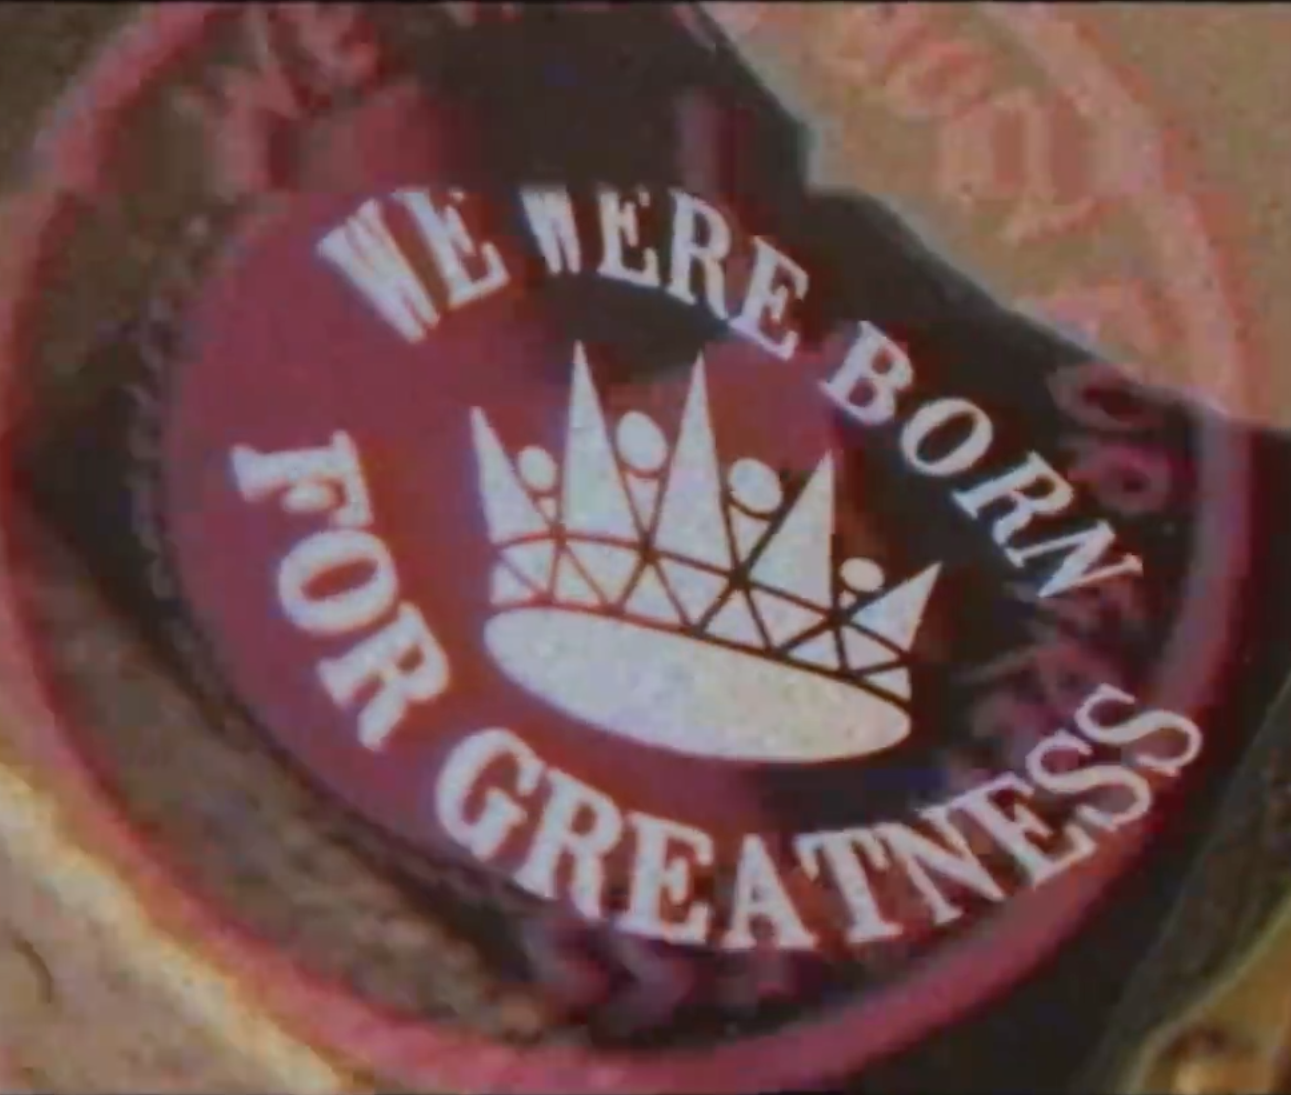 We Were Born For Greatness Papa Roach Lyrics